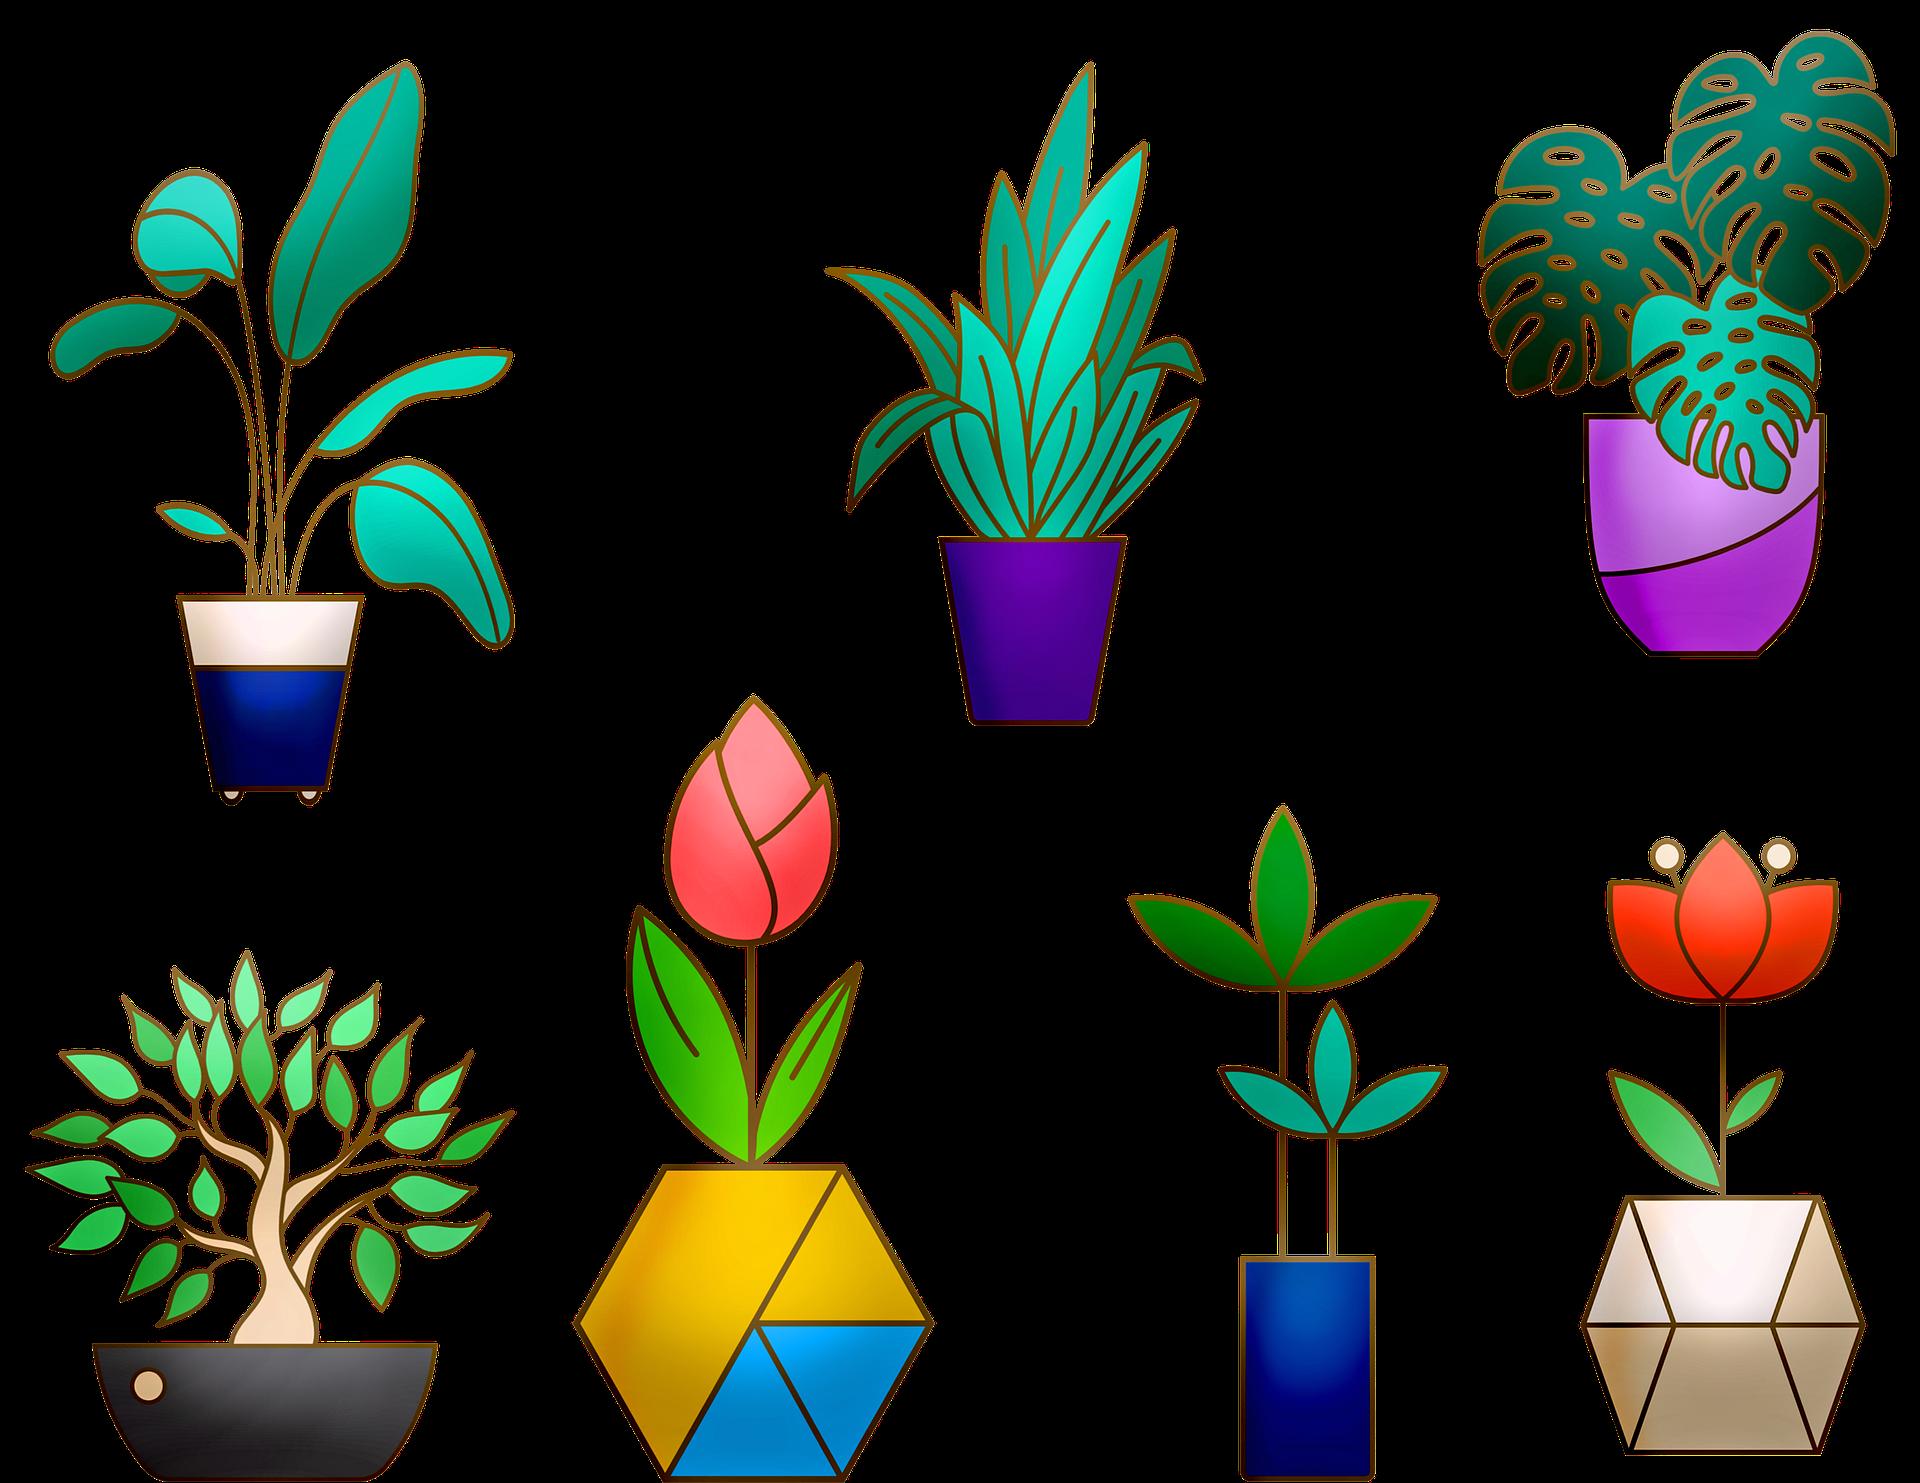 house-plants-4116992_1920